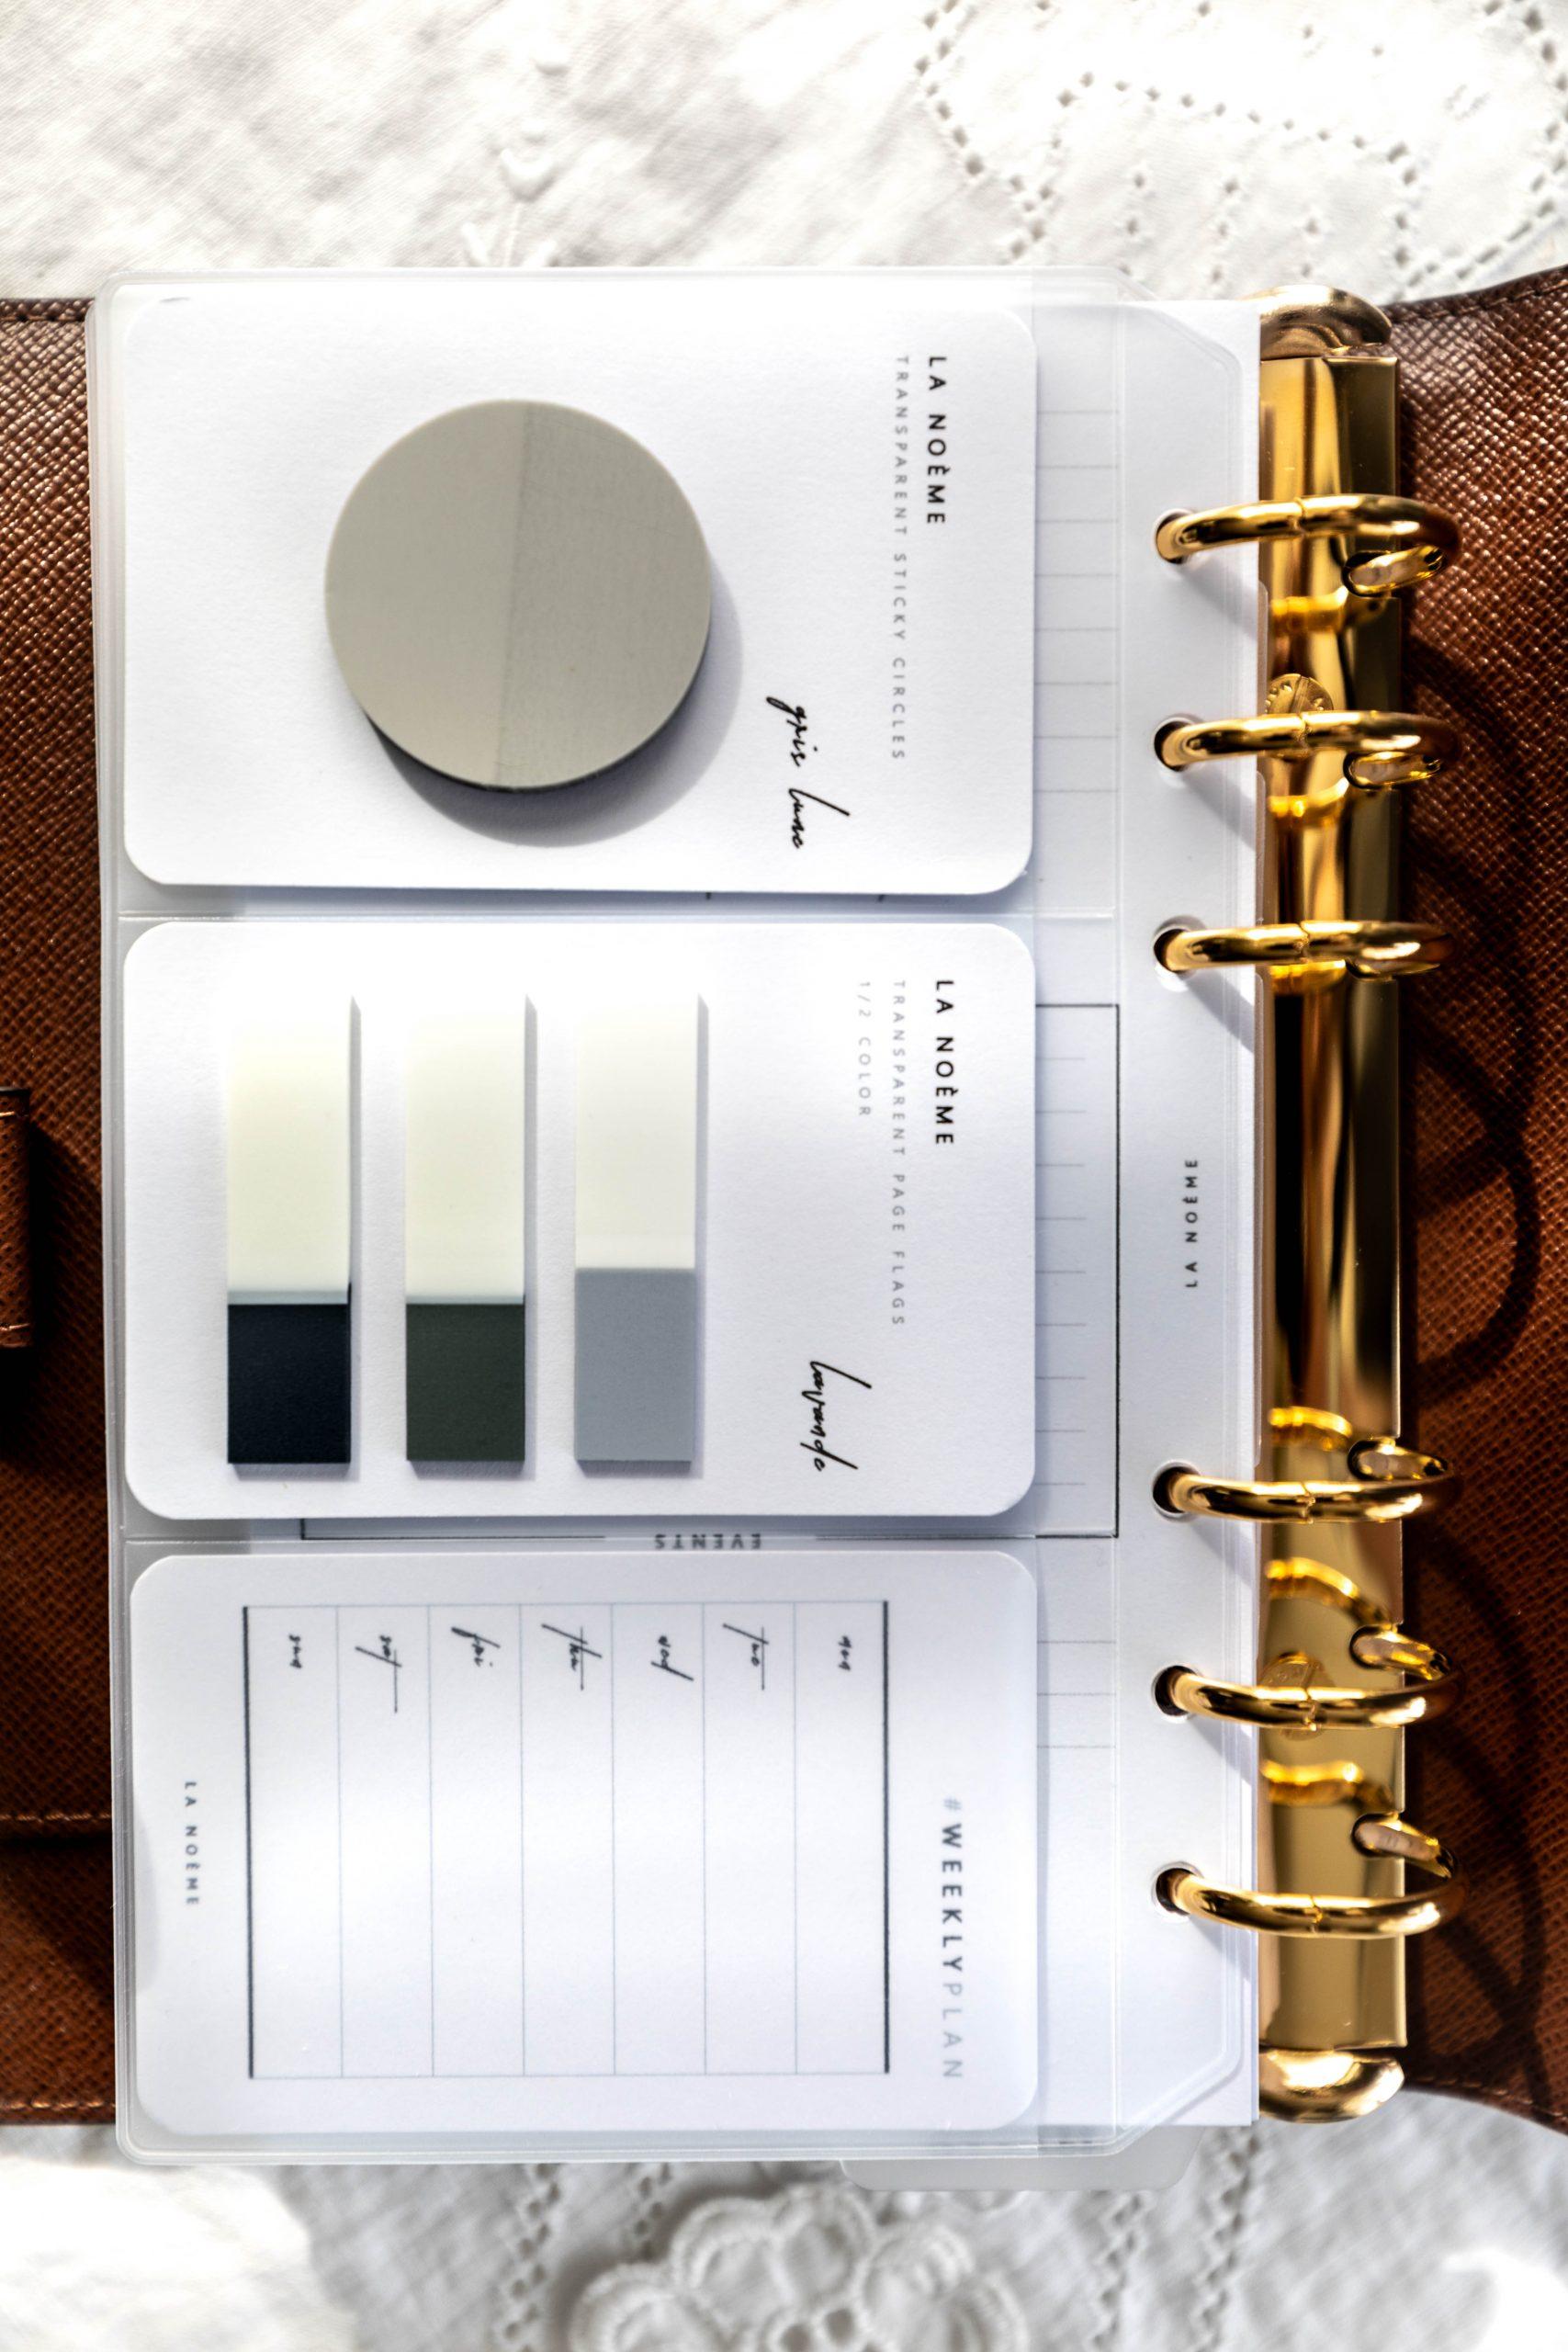 Louis Vuitton Agenda Setup Plastic Dashboard Pages with 3 Card Holder Slots Annie Fairfax